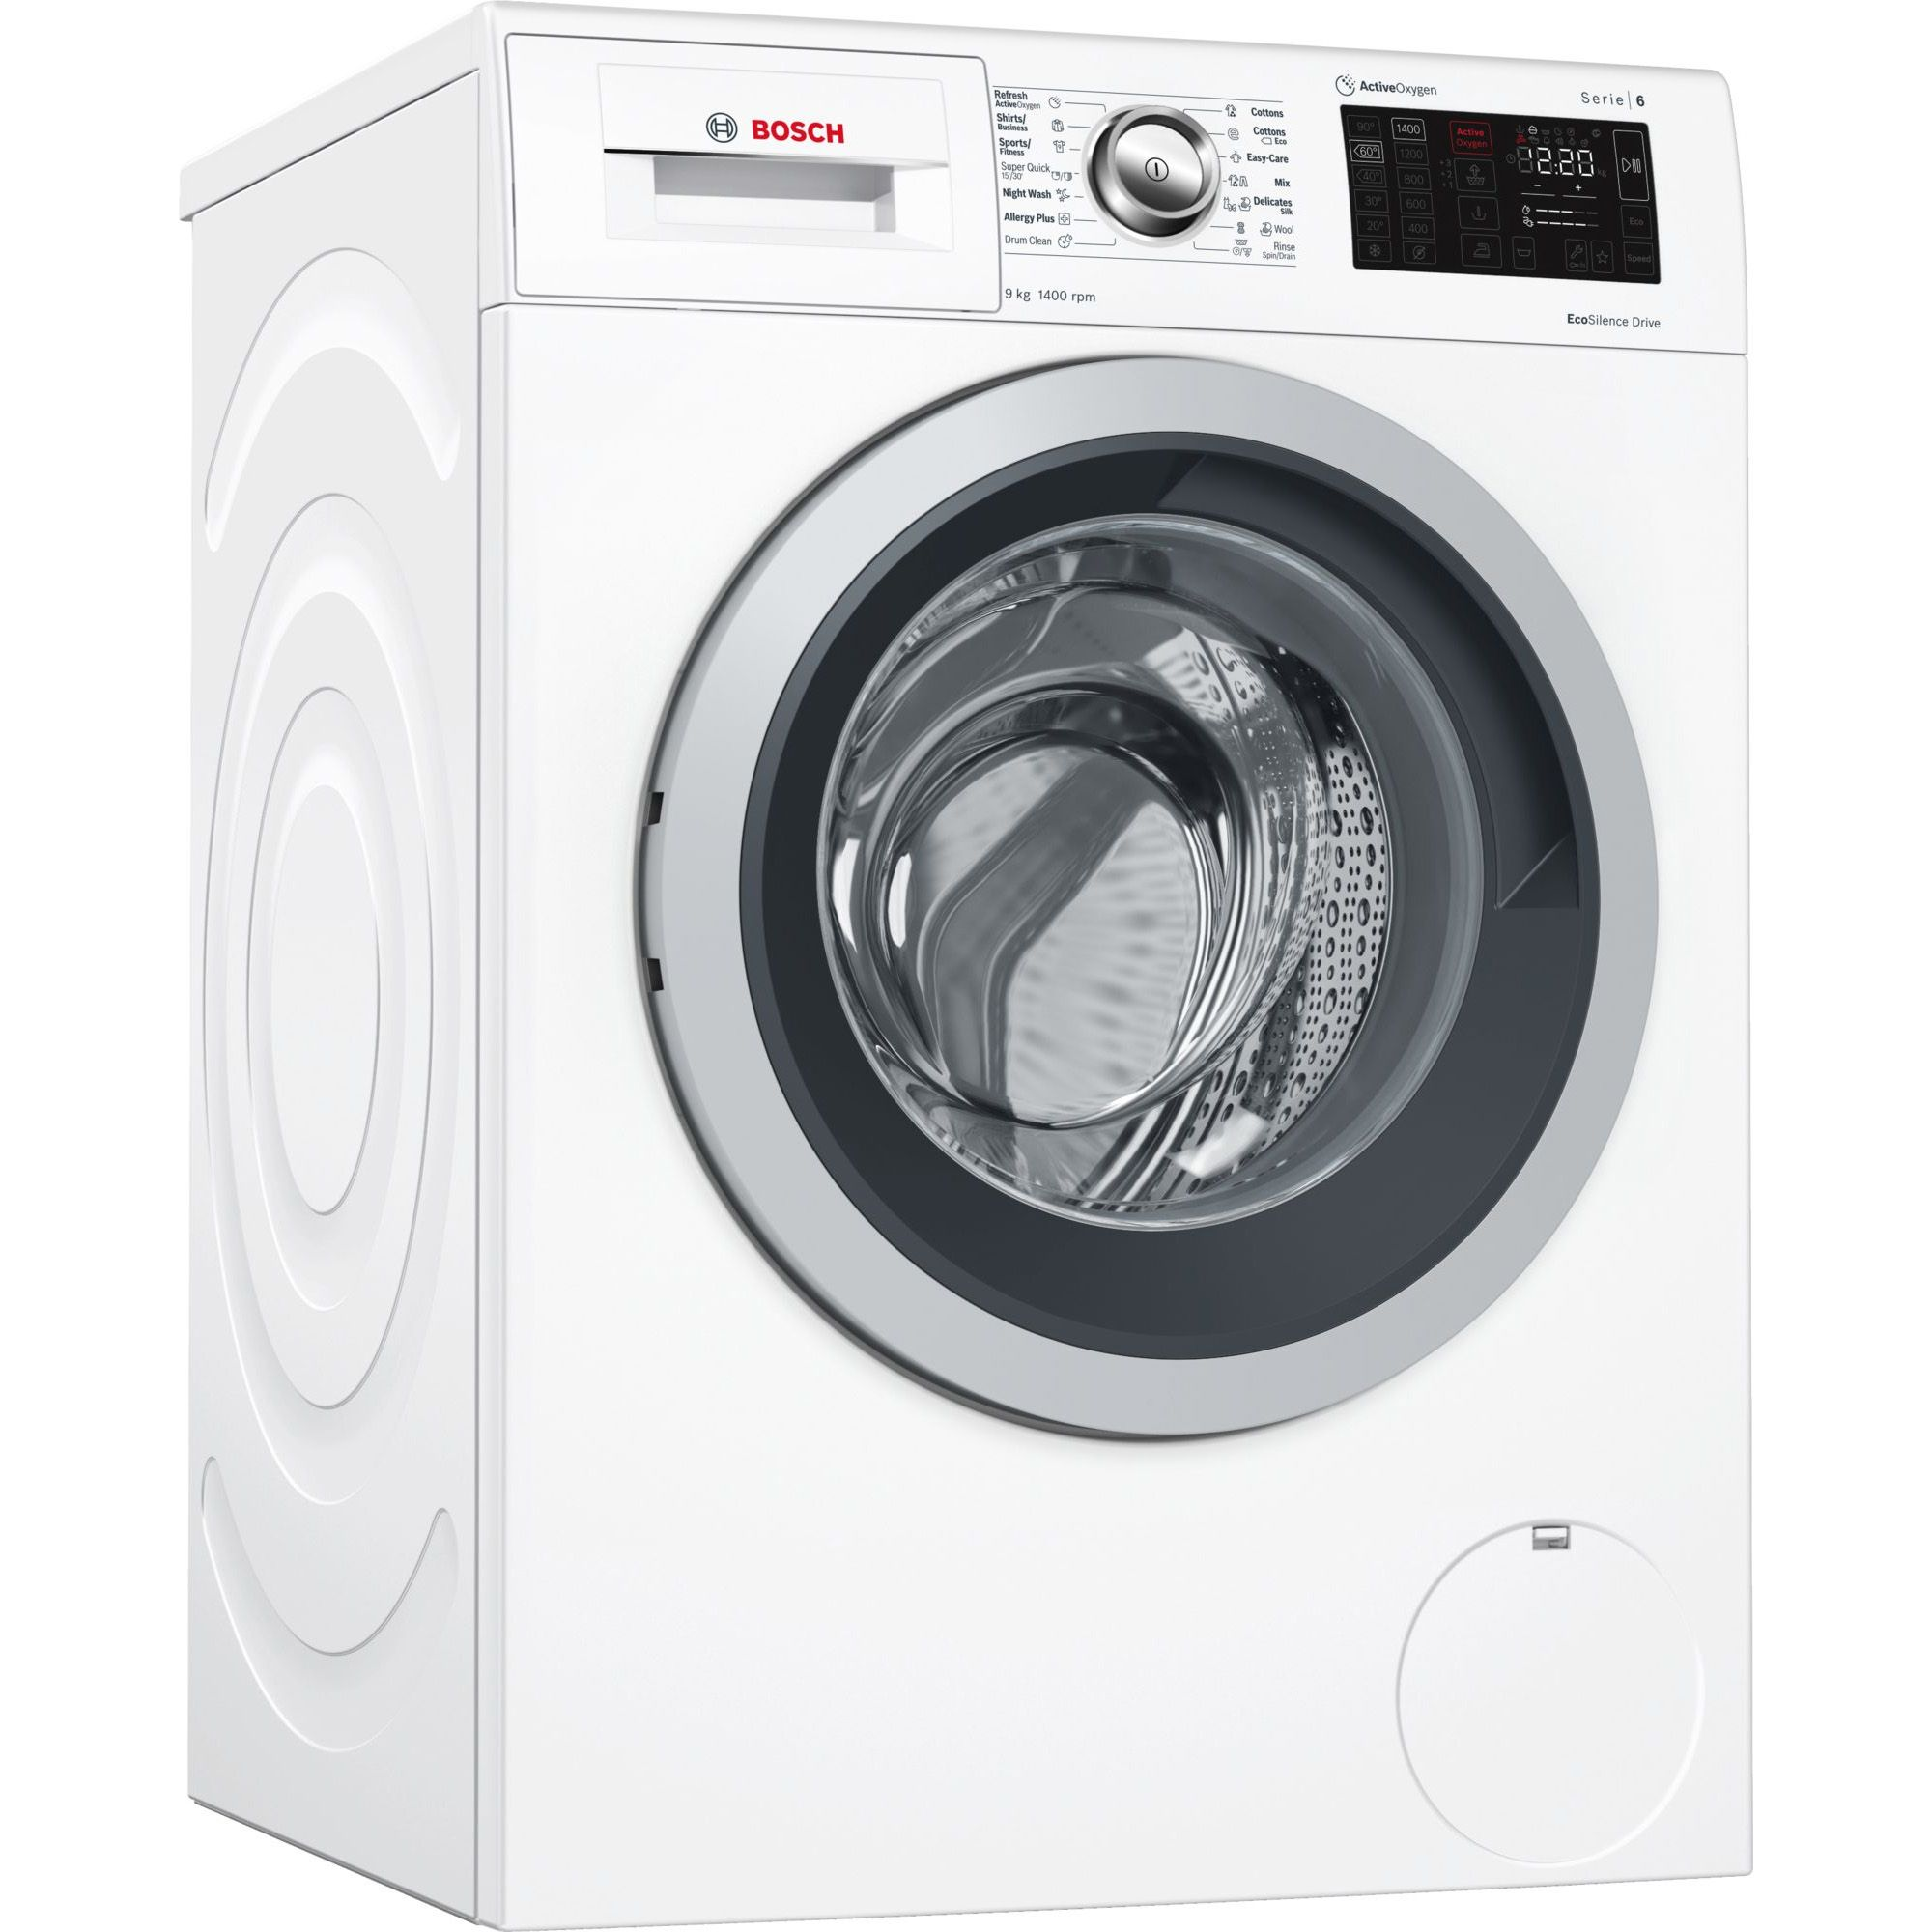 Masina de spalat rufe Bosch WAT28761BY, ActiveOxygen, 9 kg, 1400 RPM, Clasa A+++, 60 cm, Alb